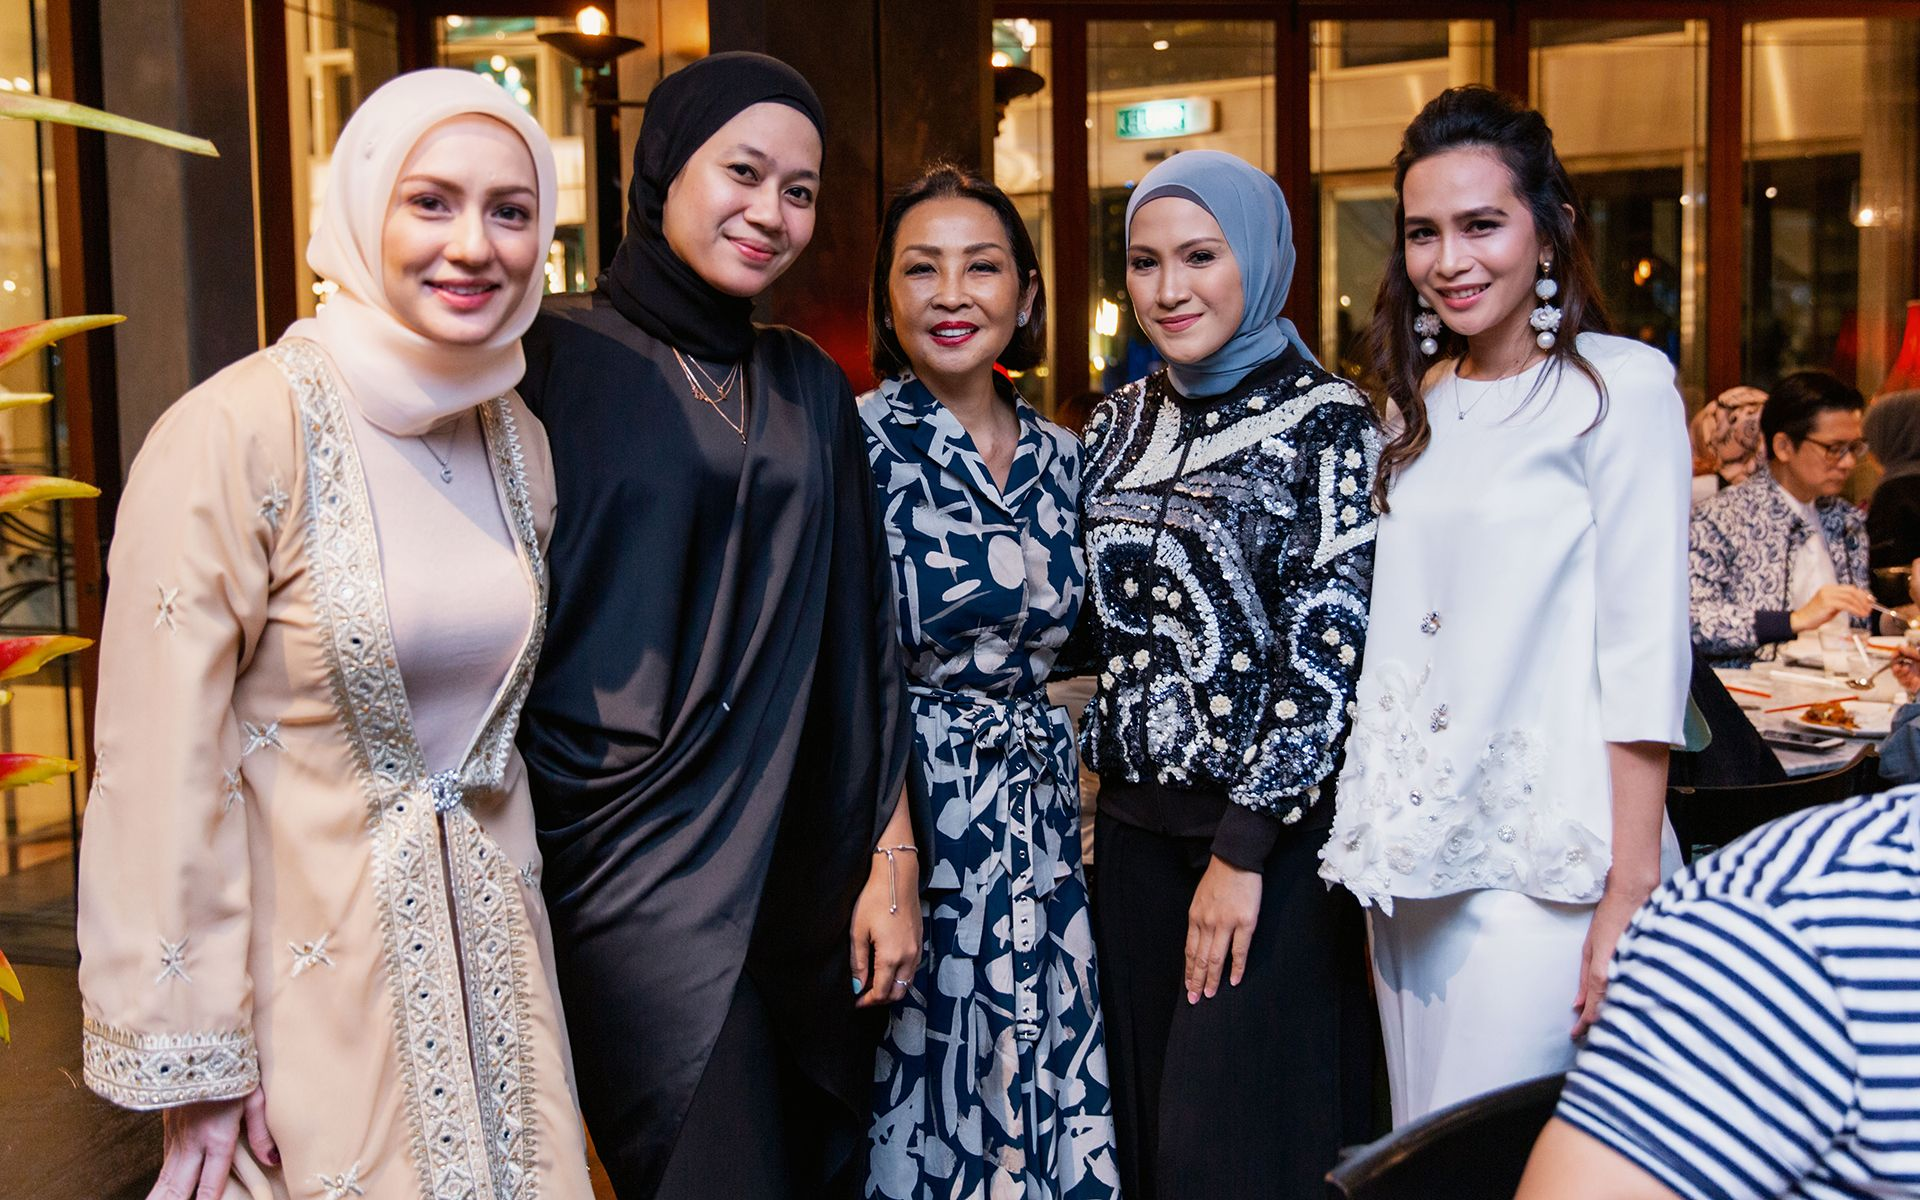 Nadia Annuar, Zairina Zailani, Dato' Seri Farah Khan, Sherry Ibrahim and Azlina Hamzah